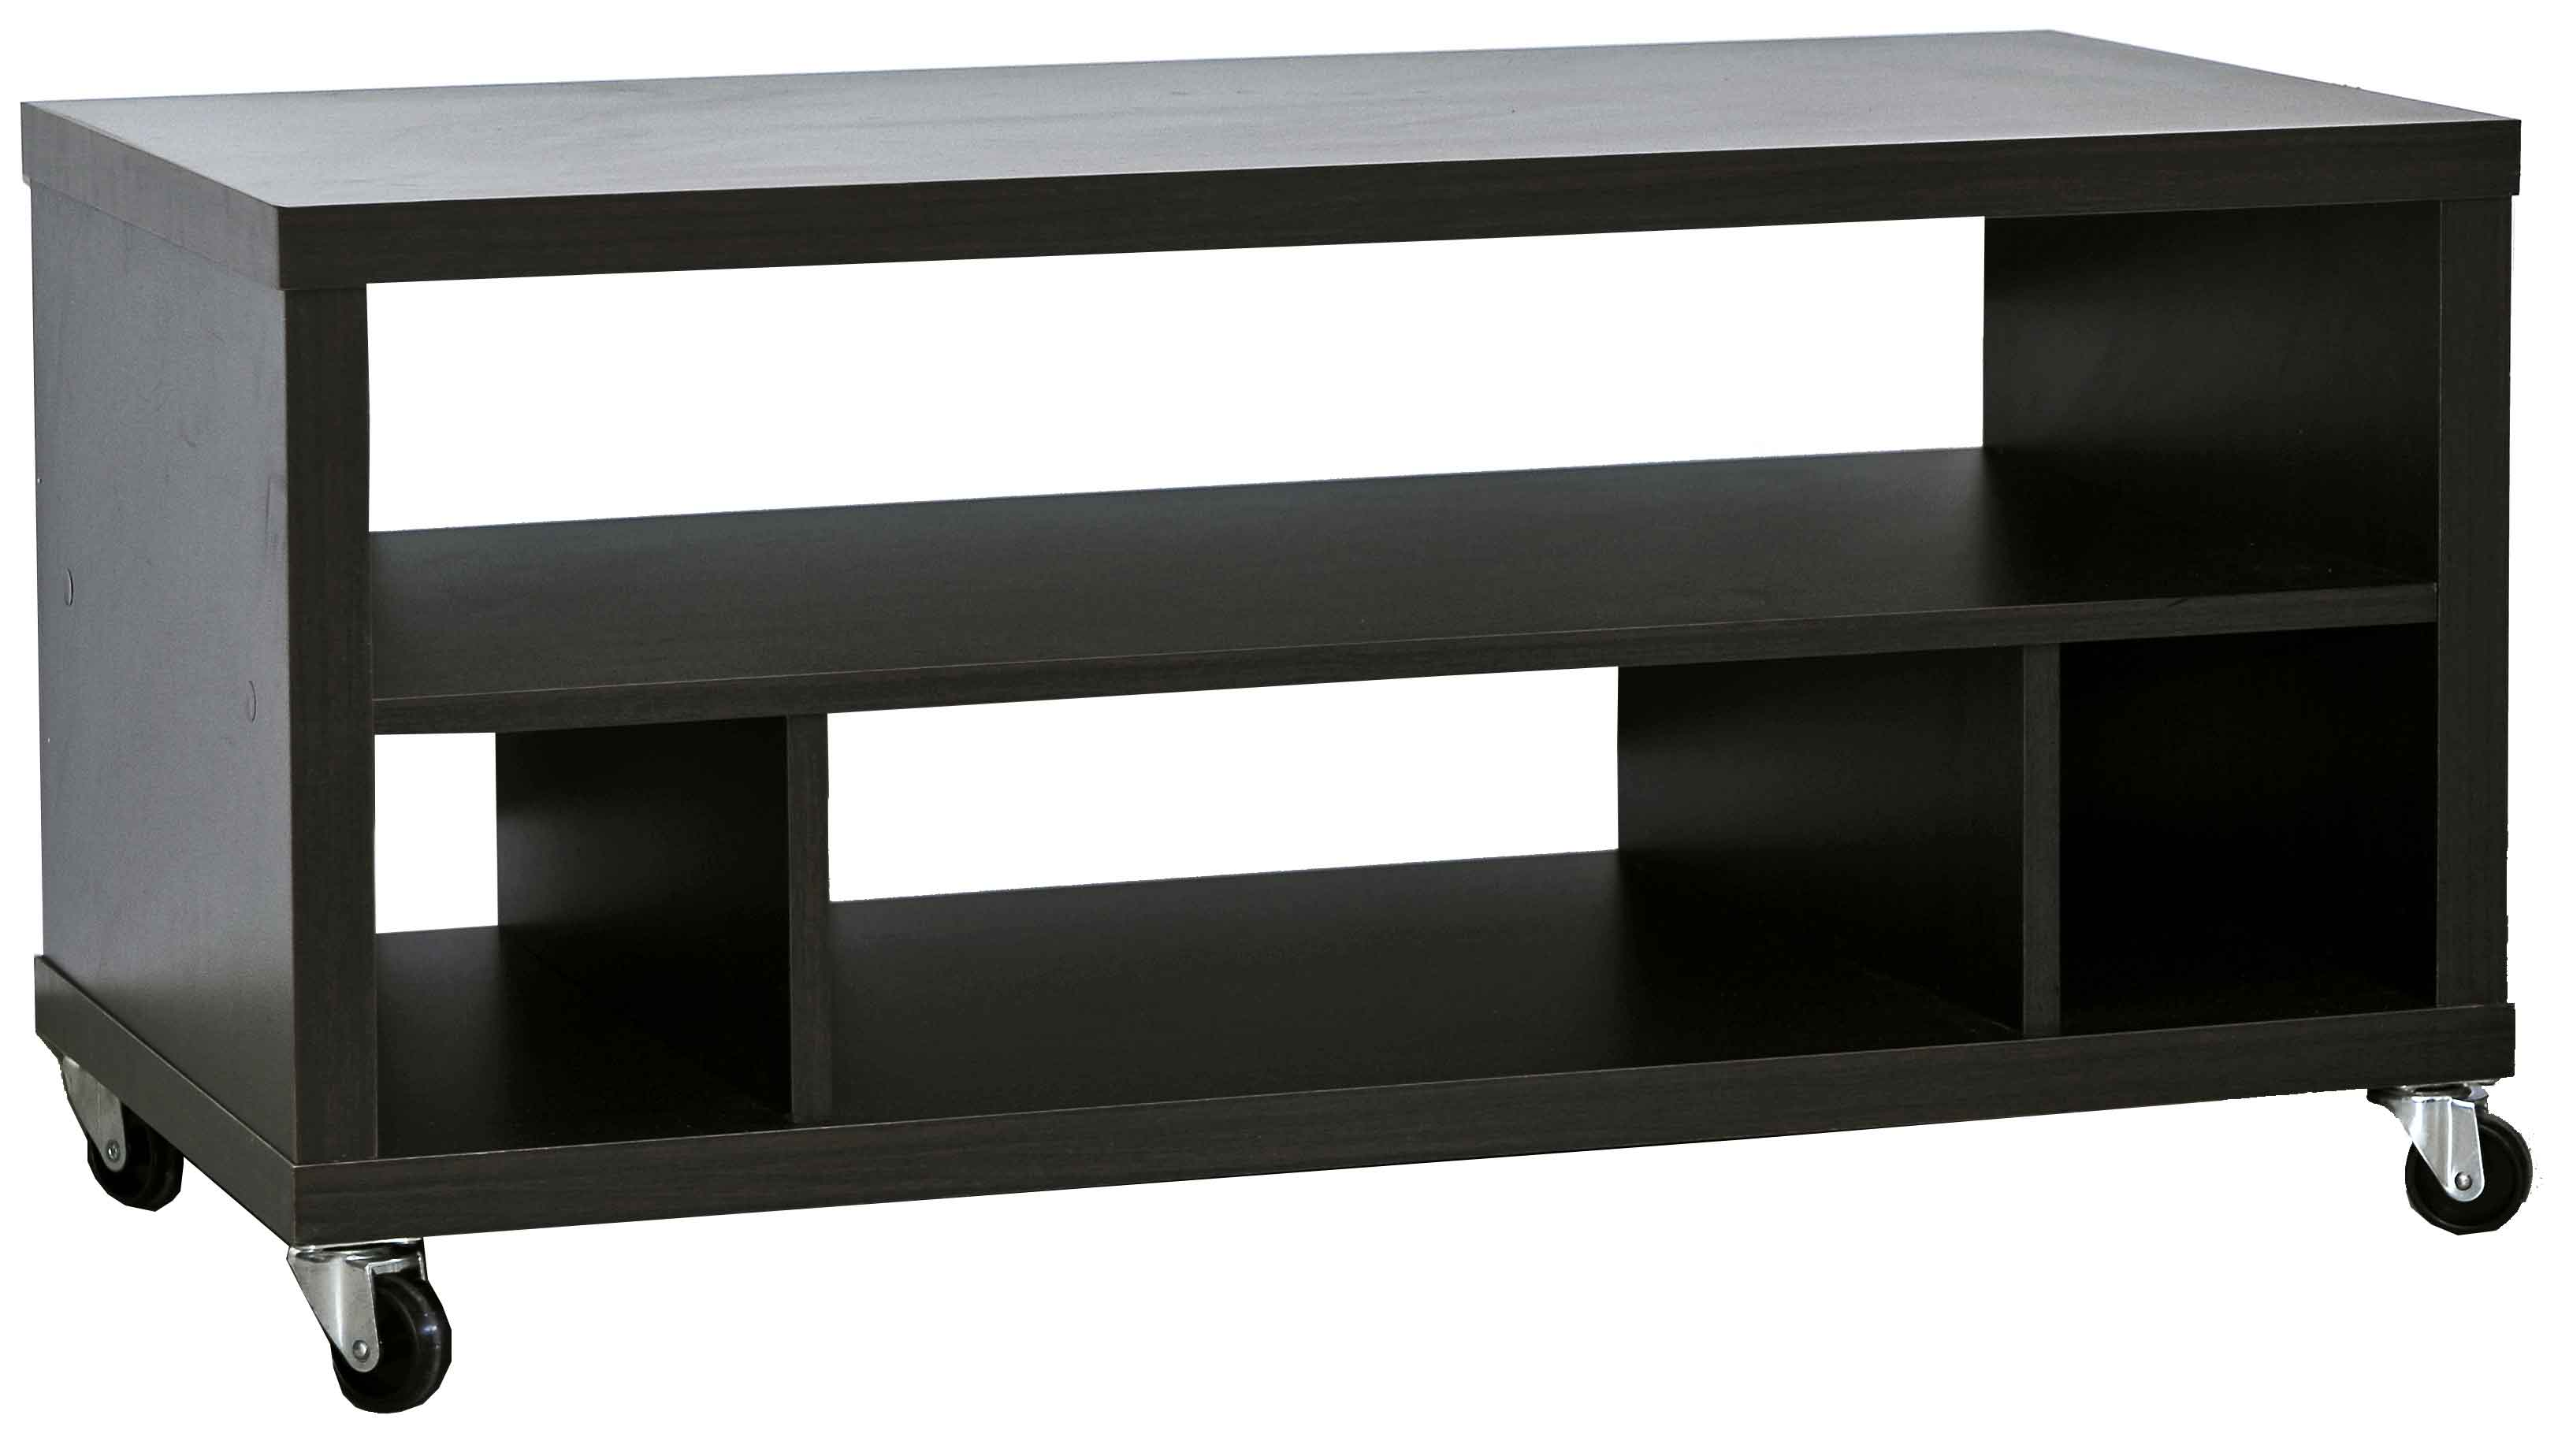 TV STAND MELAMINE WENGE COLOR WITH PVC ENDING :30mm 15mm - -